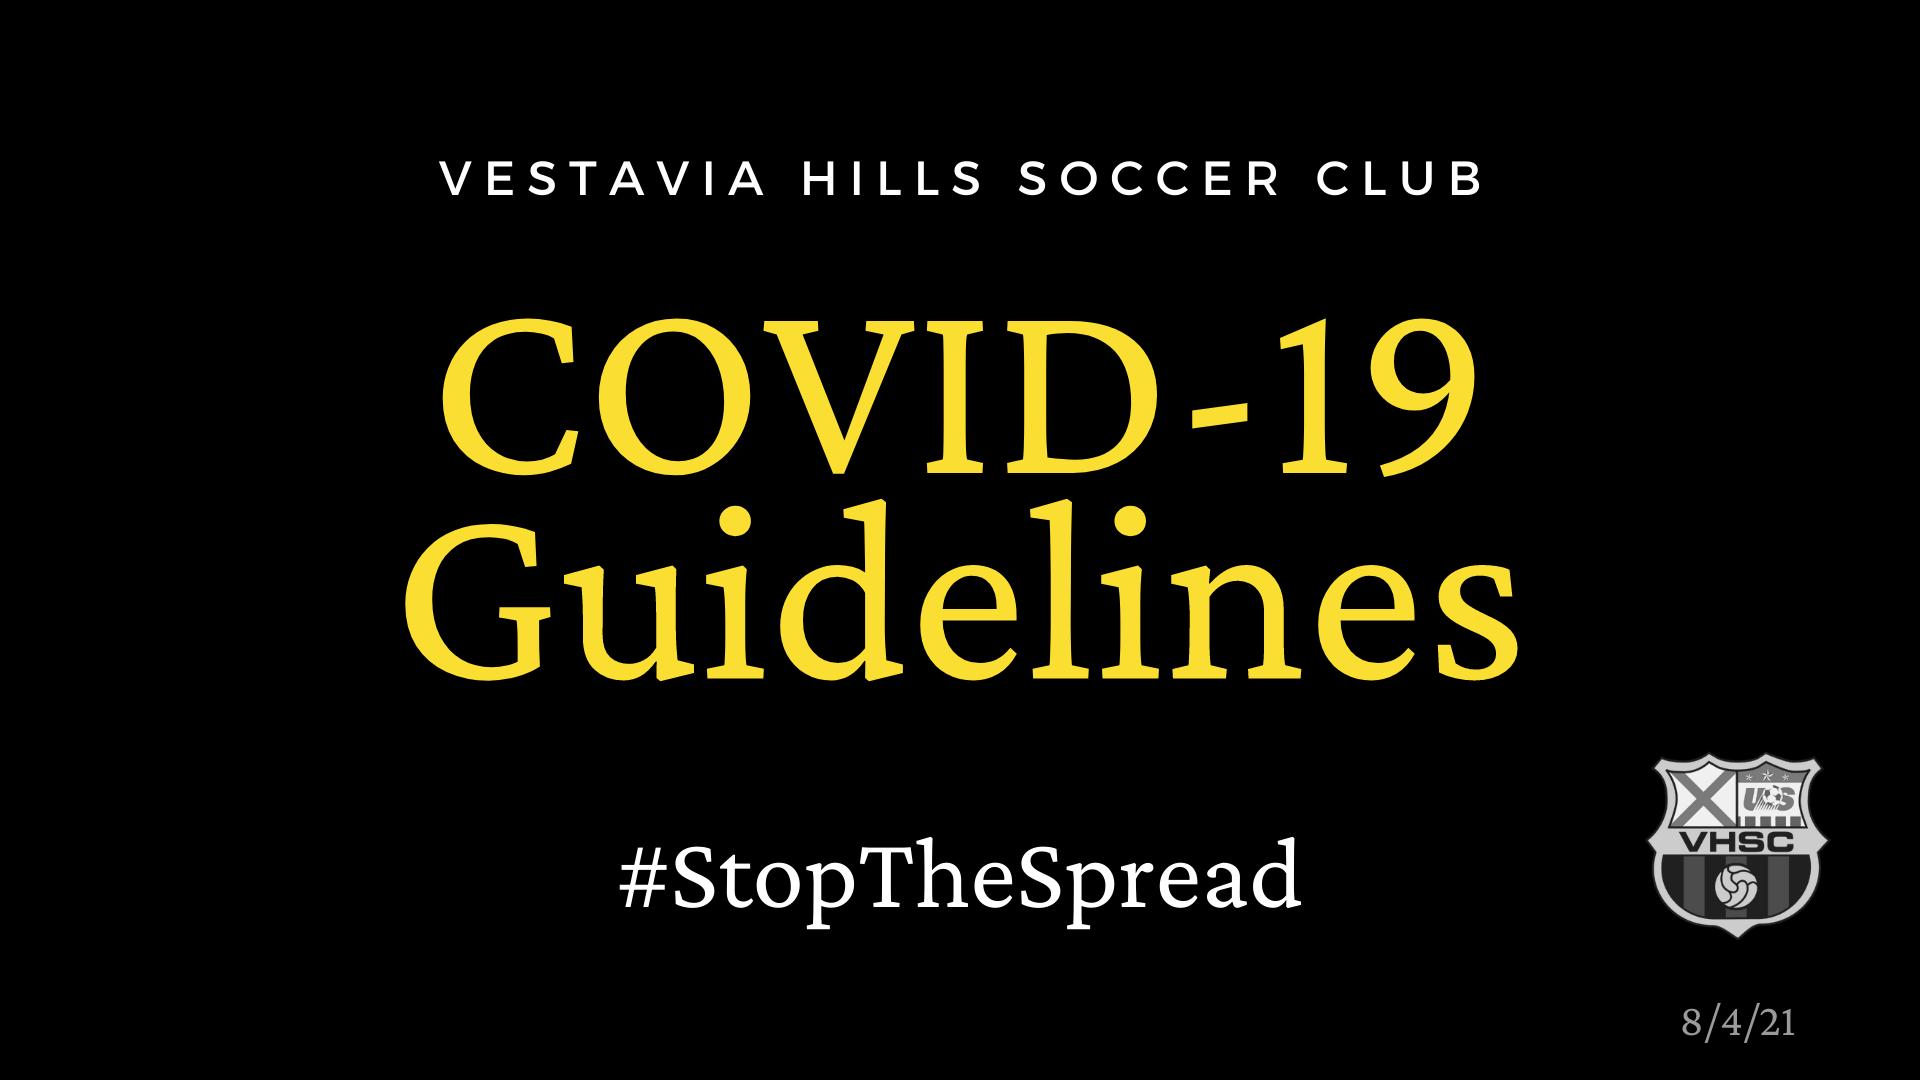 1920x1080 COVID Updates VHSC 8-4-21